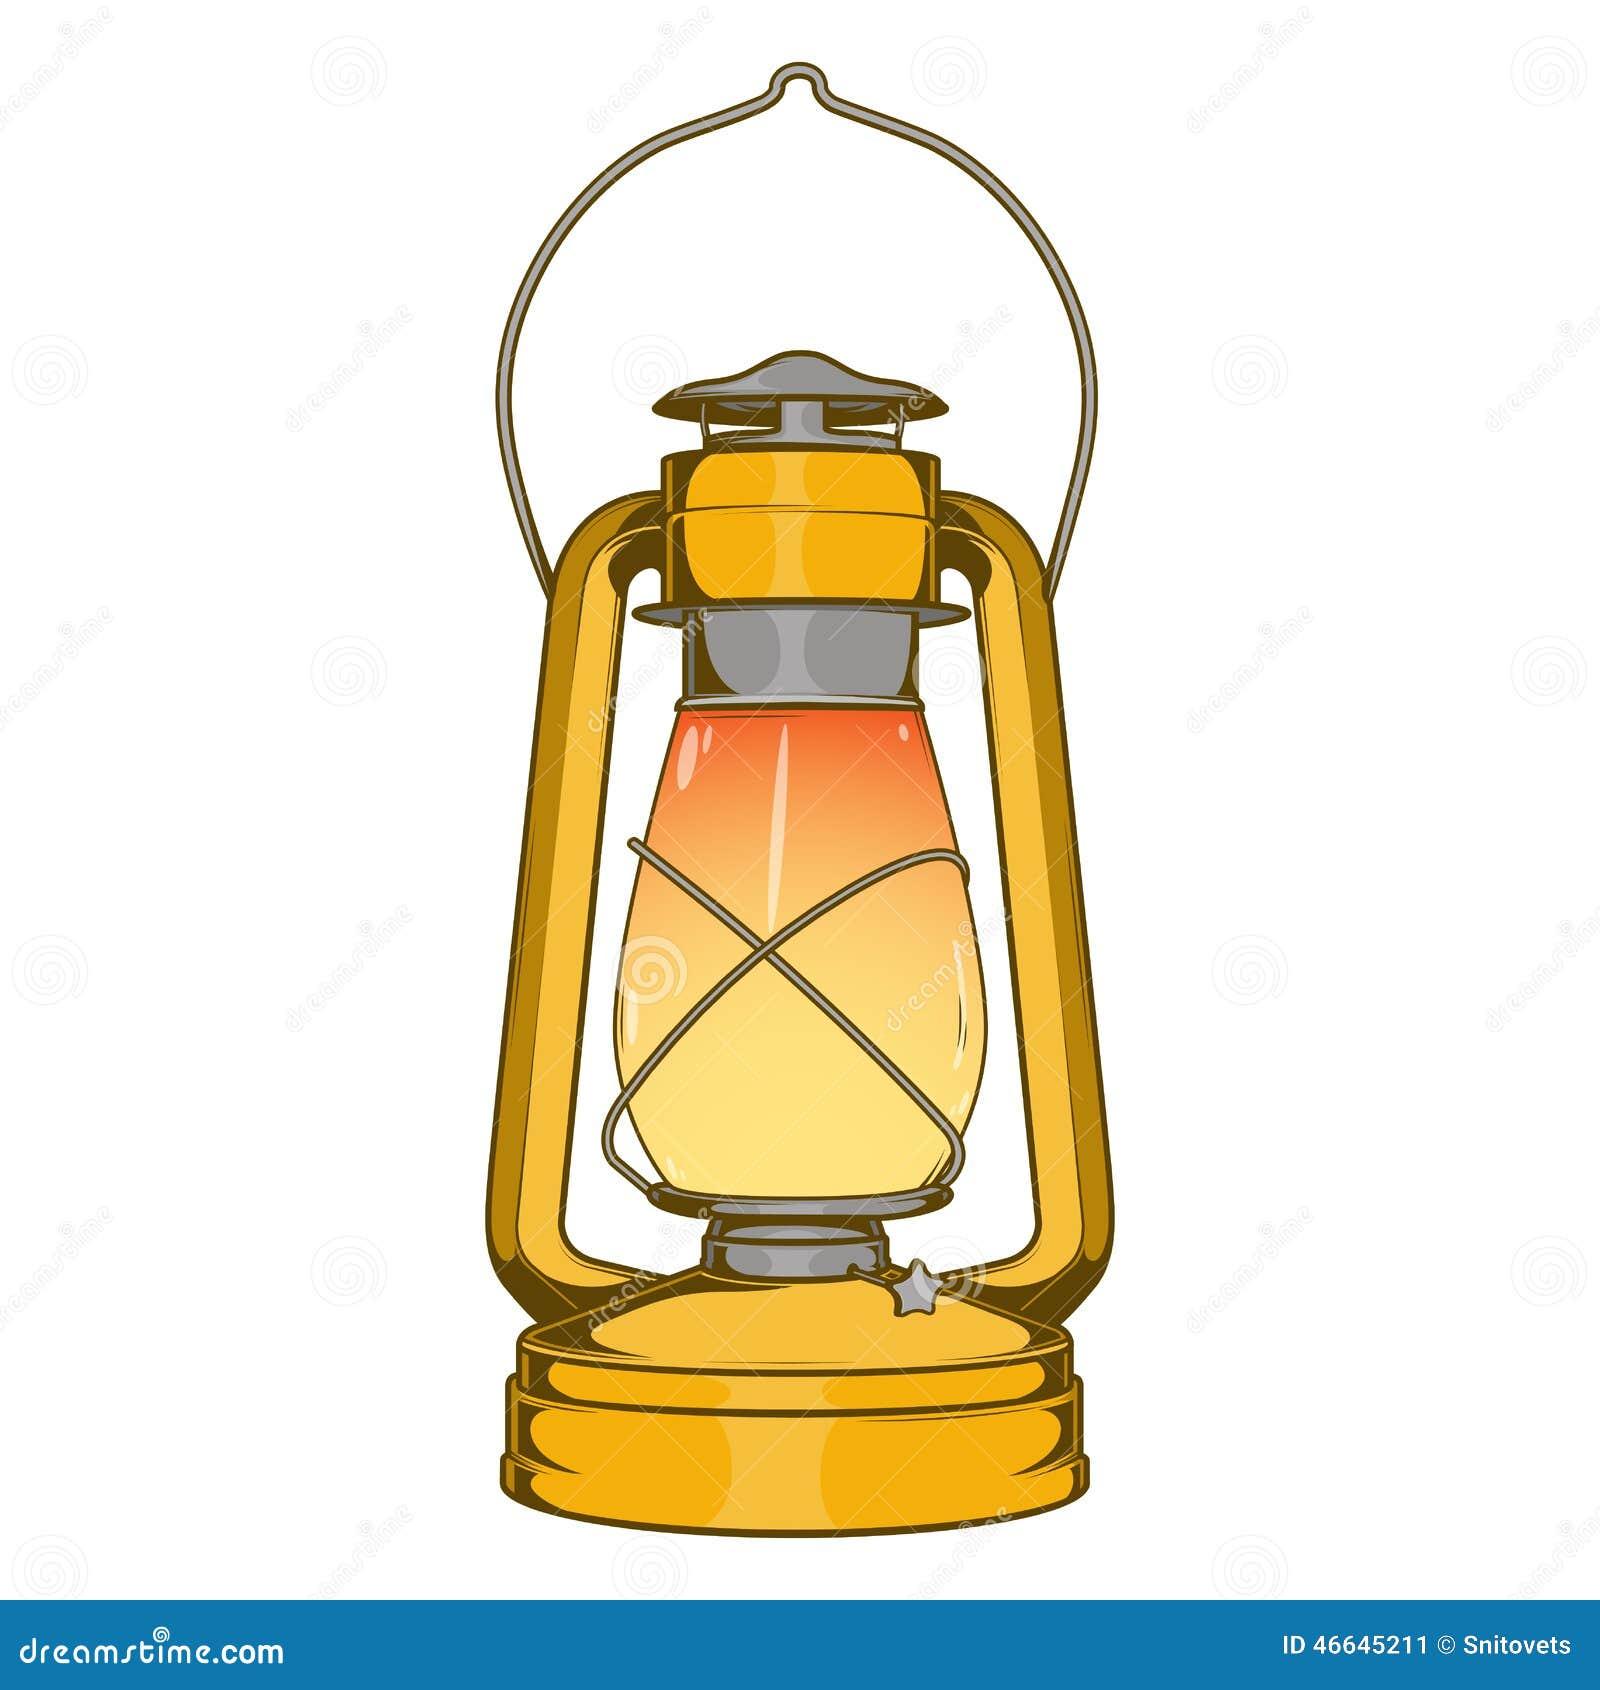 Antique Brass Old Kerosene Lamp Isolated On A White